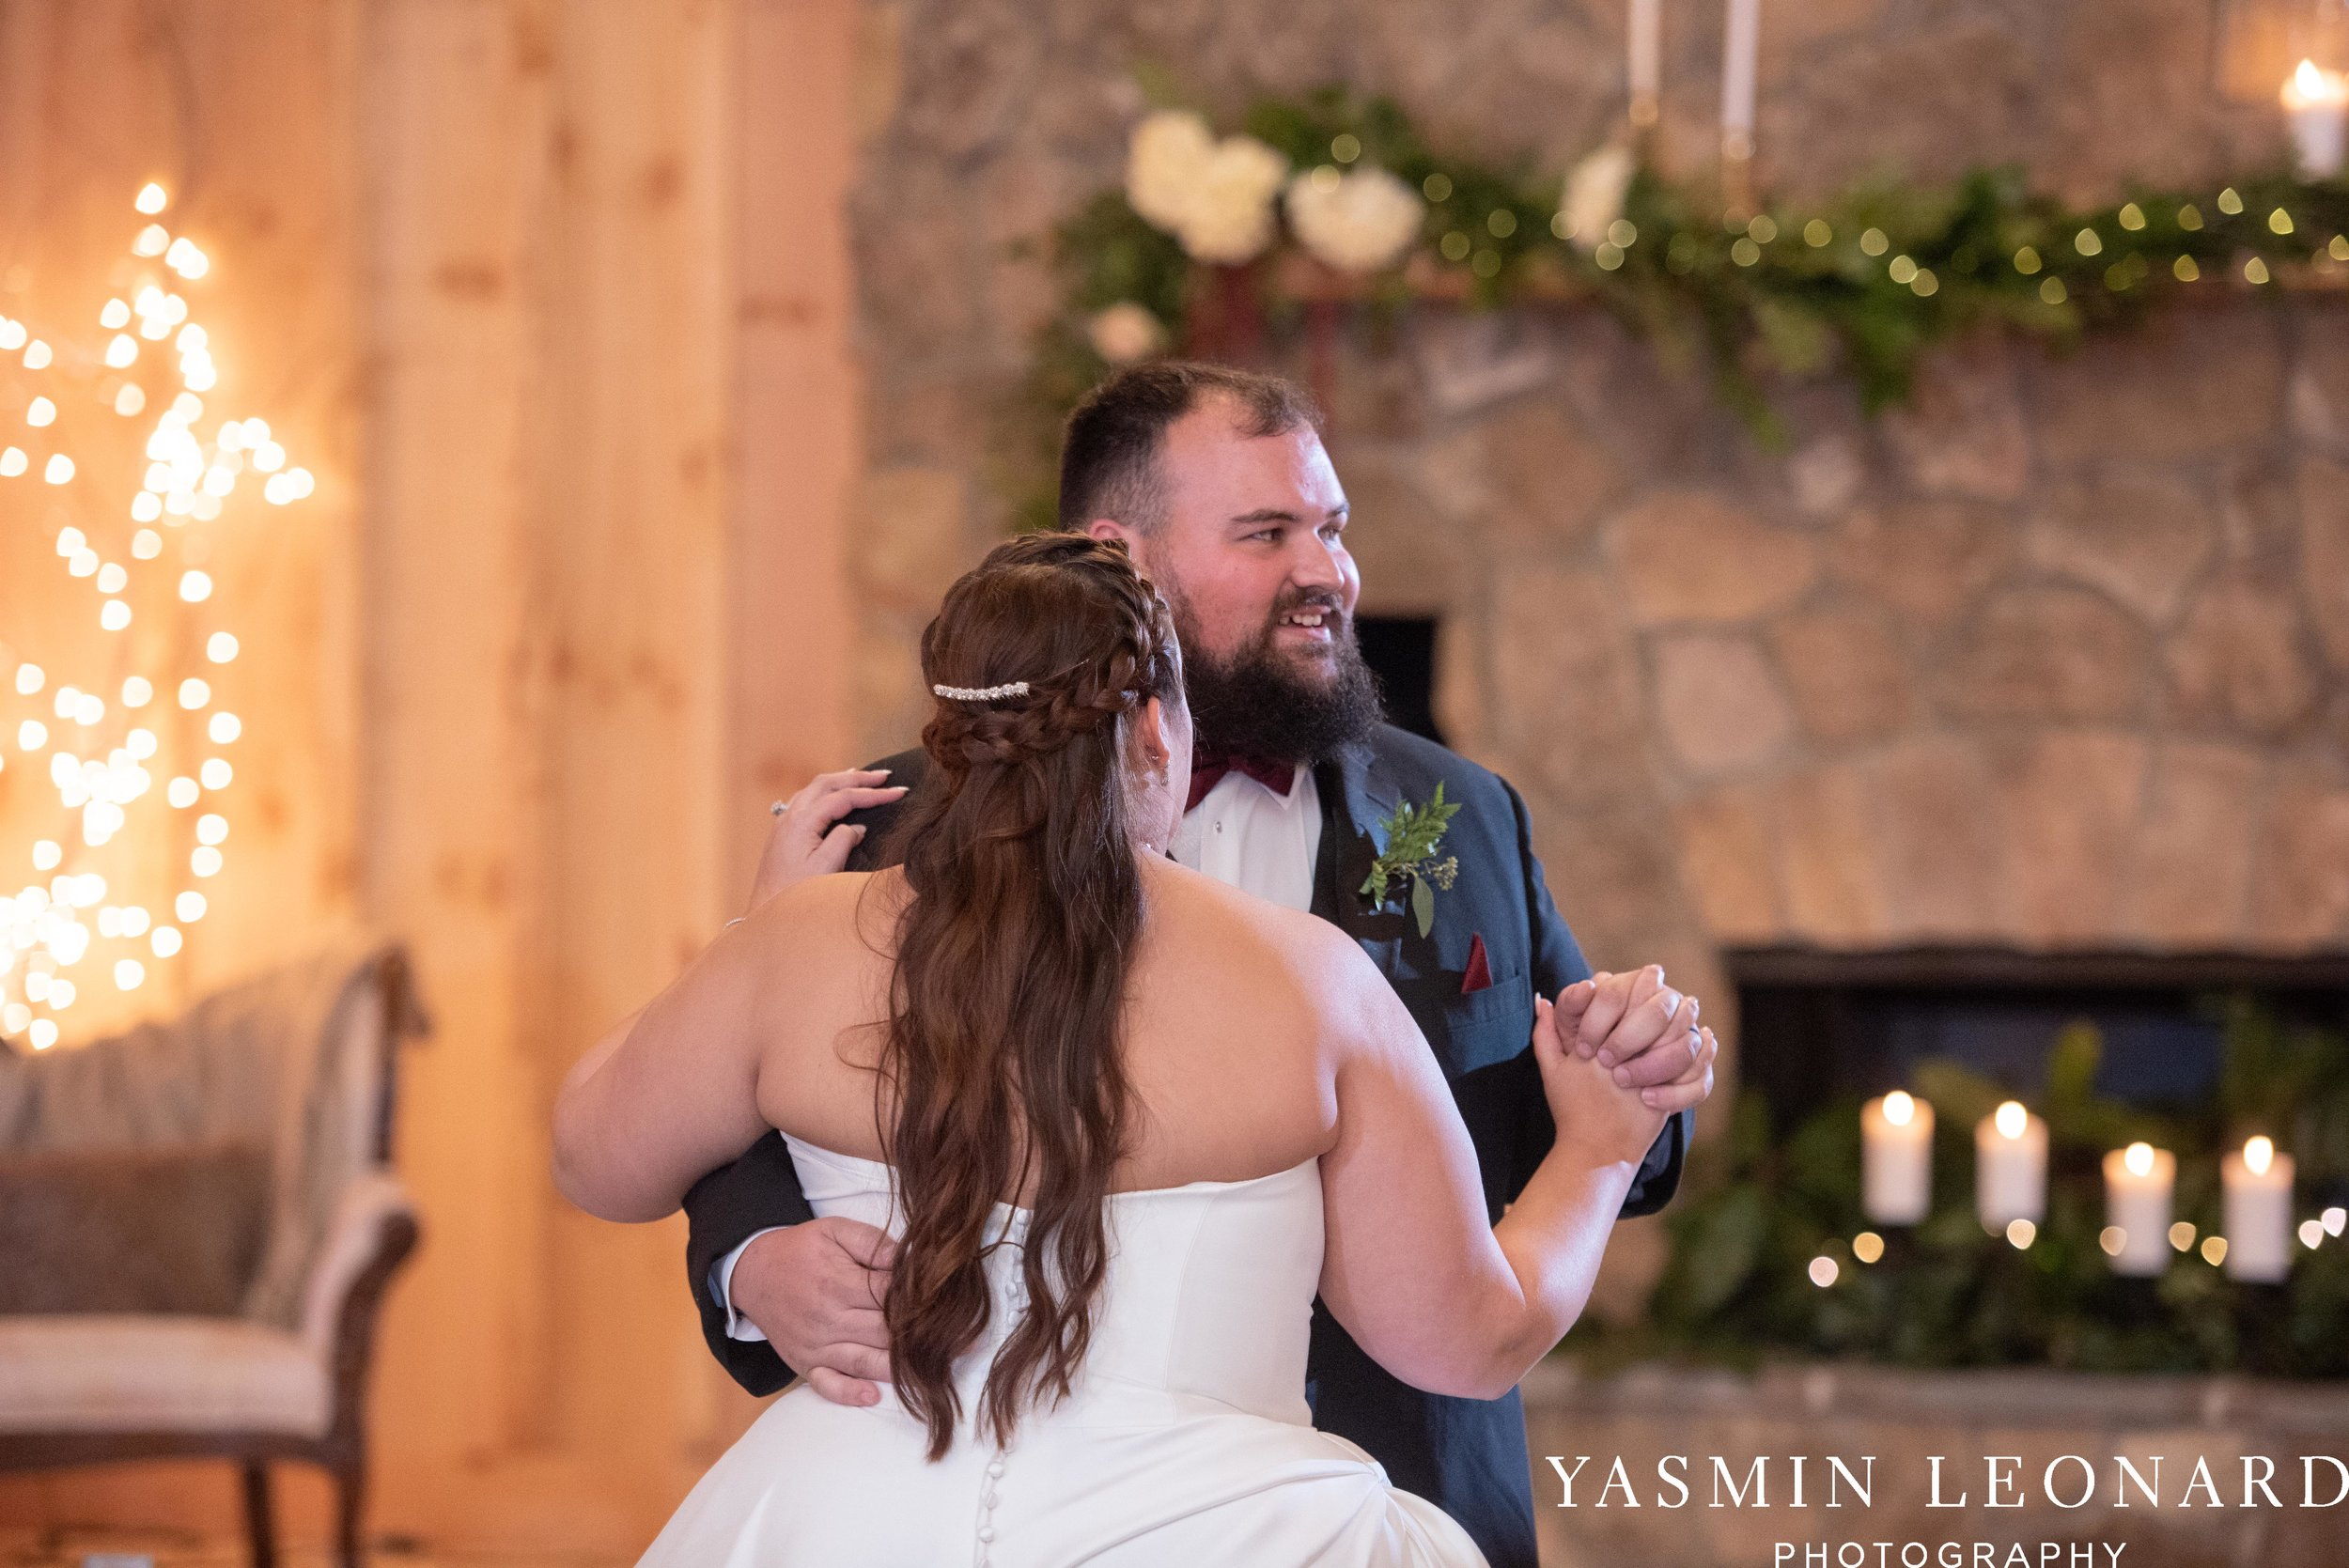 Wesley Memorial United Methodist Church - Old Homeplace Winery - High Point Weddings - High Point Wedding Photographer - NC Weddings - NC Barn Venue - Yasmin Leonard Photography-55.jpg